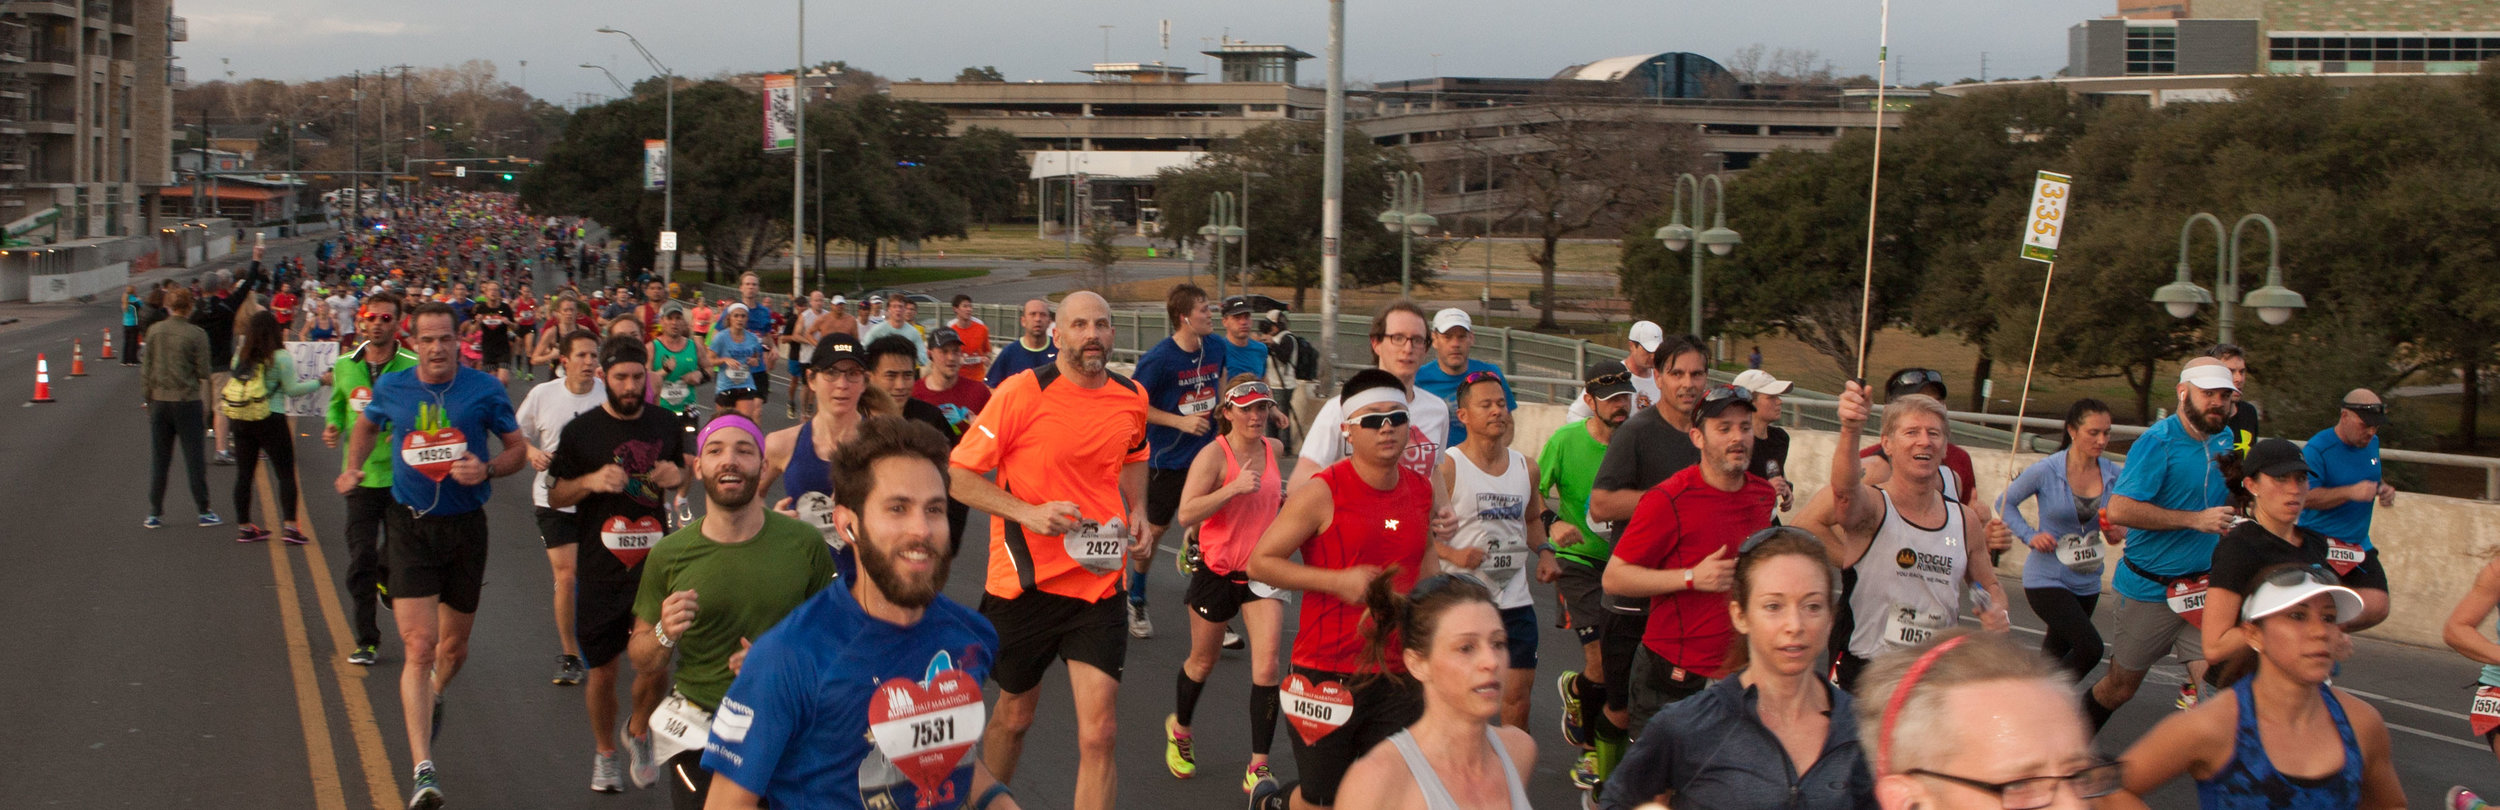 Austin Marathon 2016-33.jpg